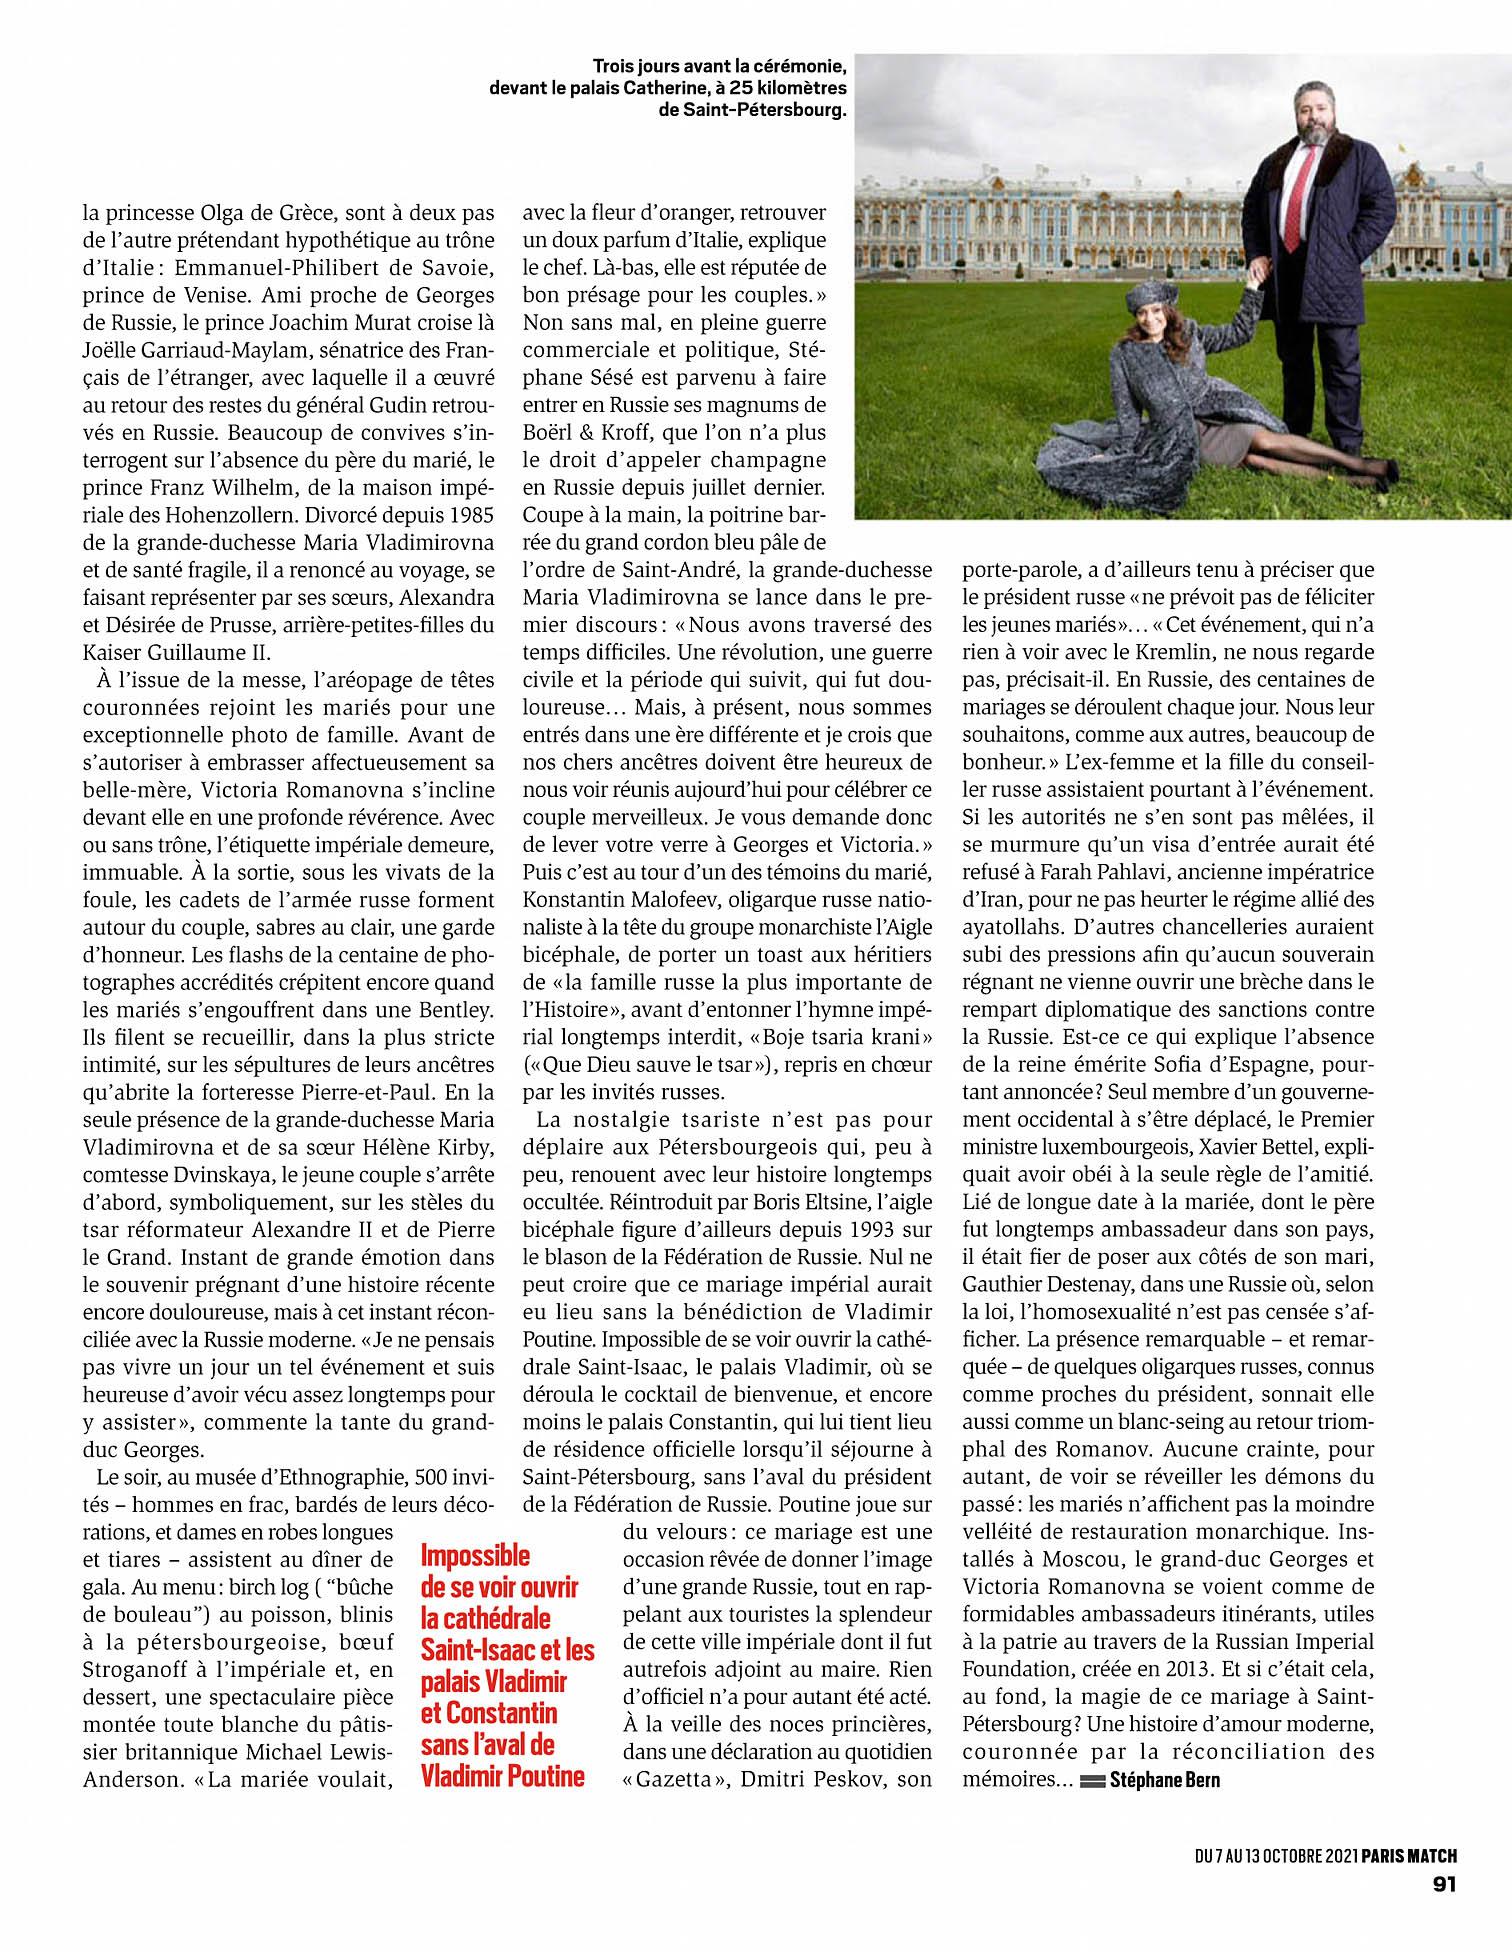 Paris Match 211007 Rus Royal 06.jpg